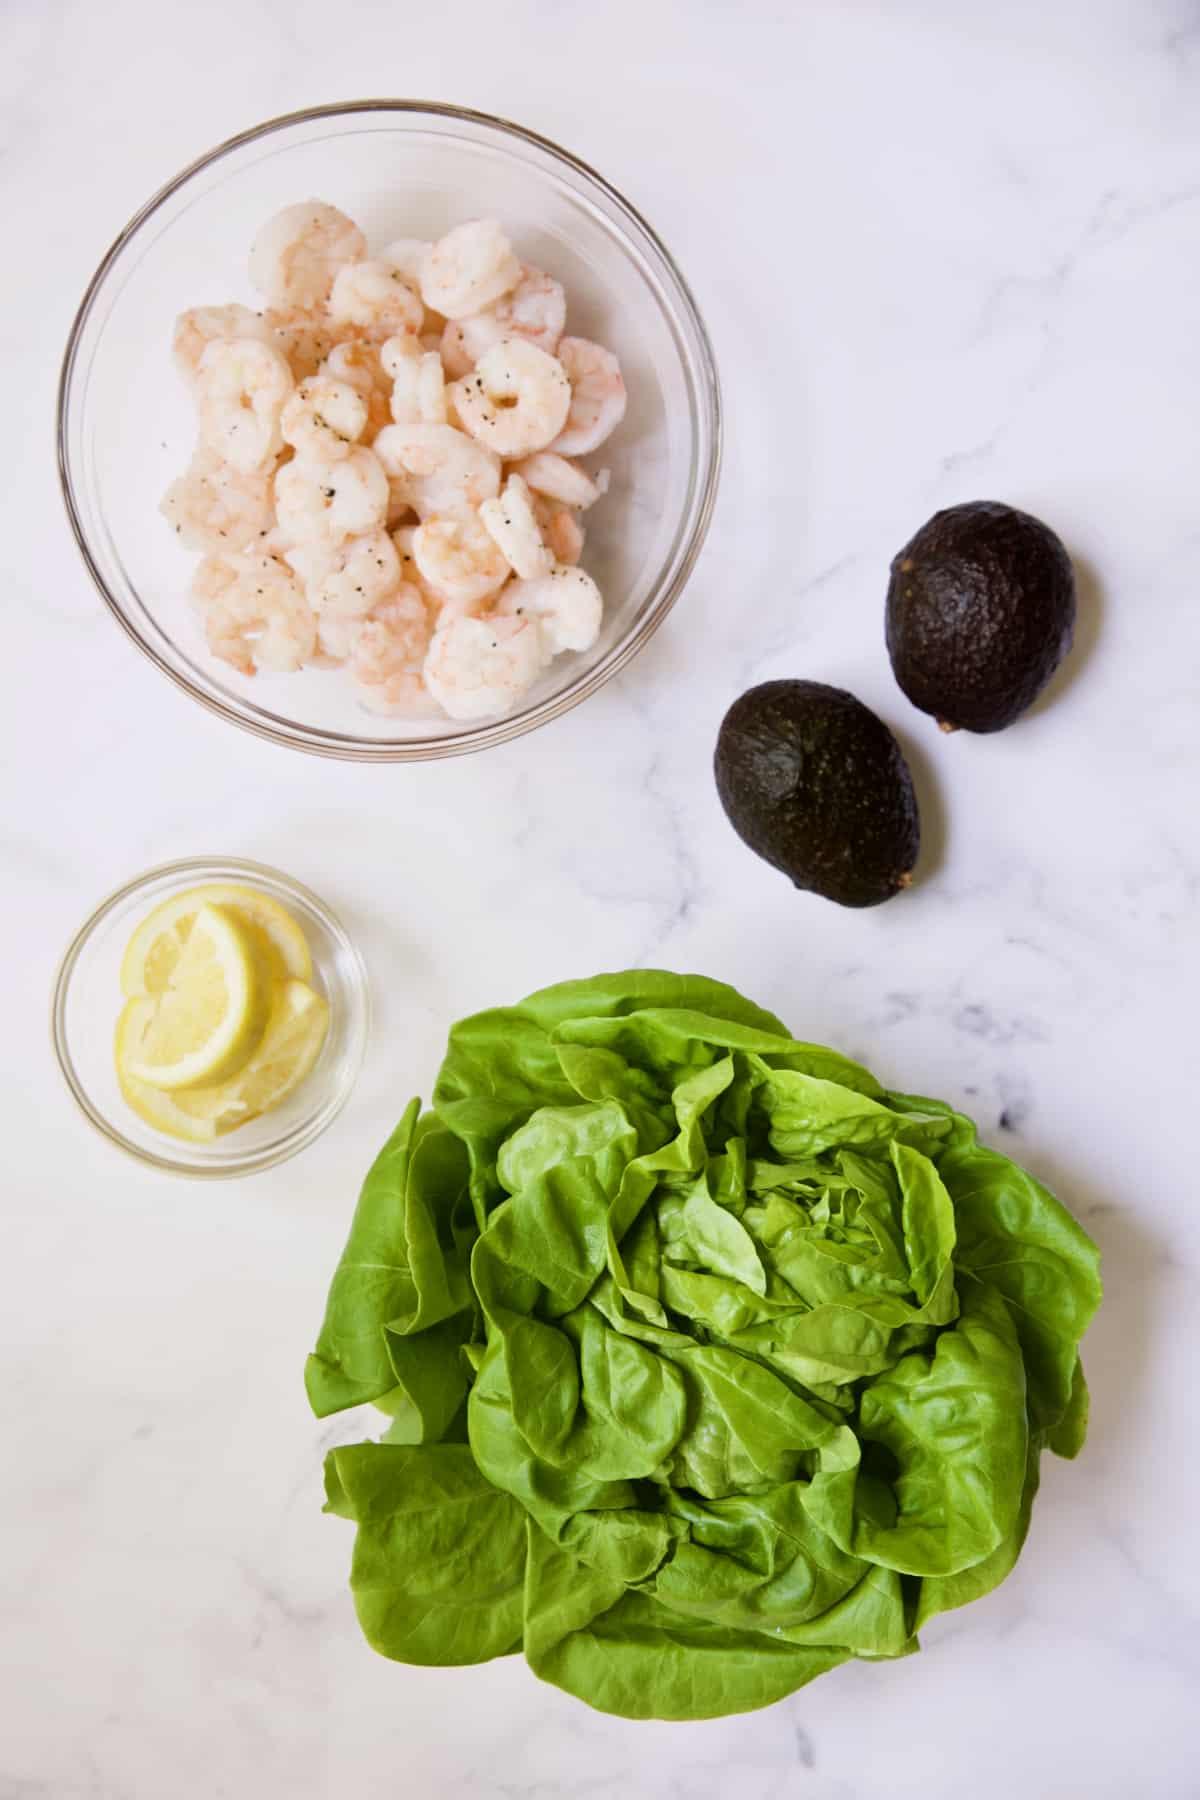 Cooked shrimp, lemon wedges, avocados and lettuce.